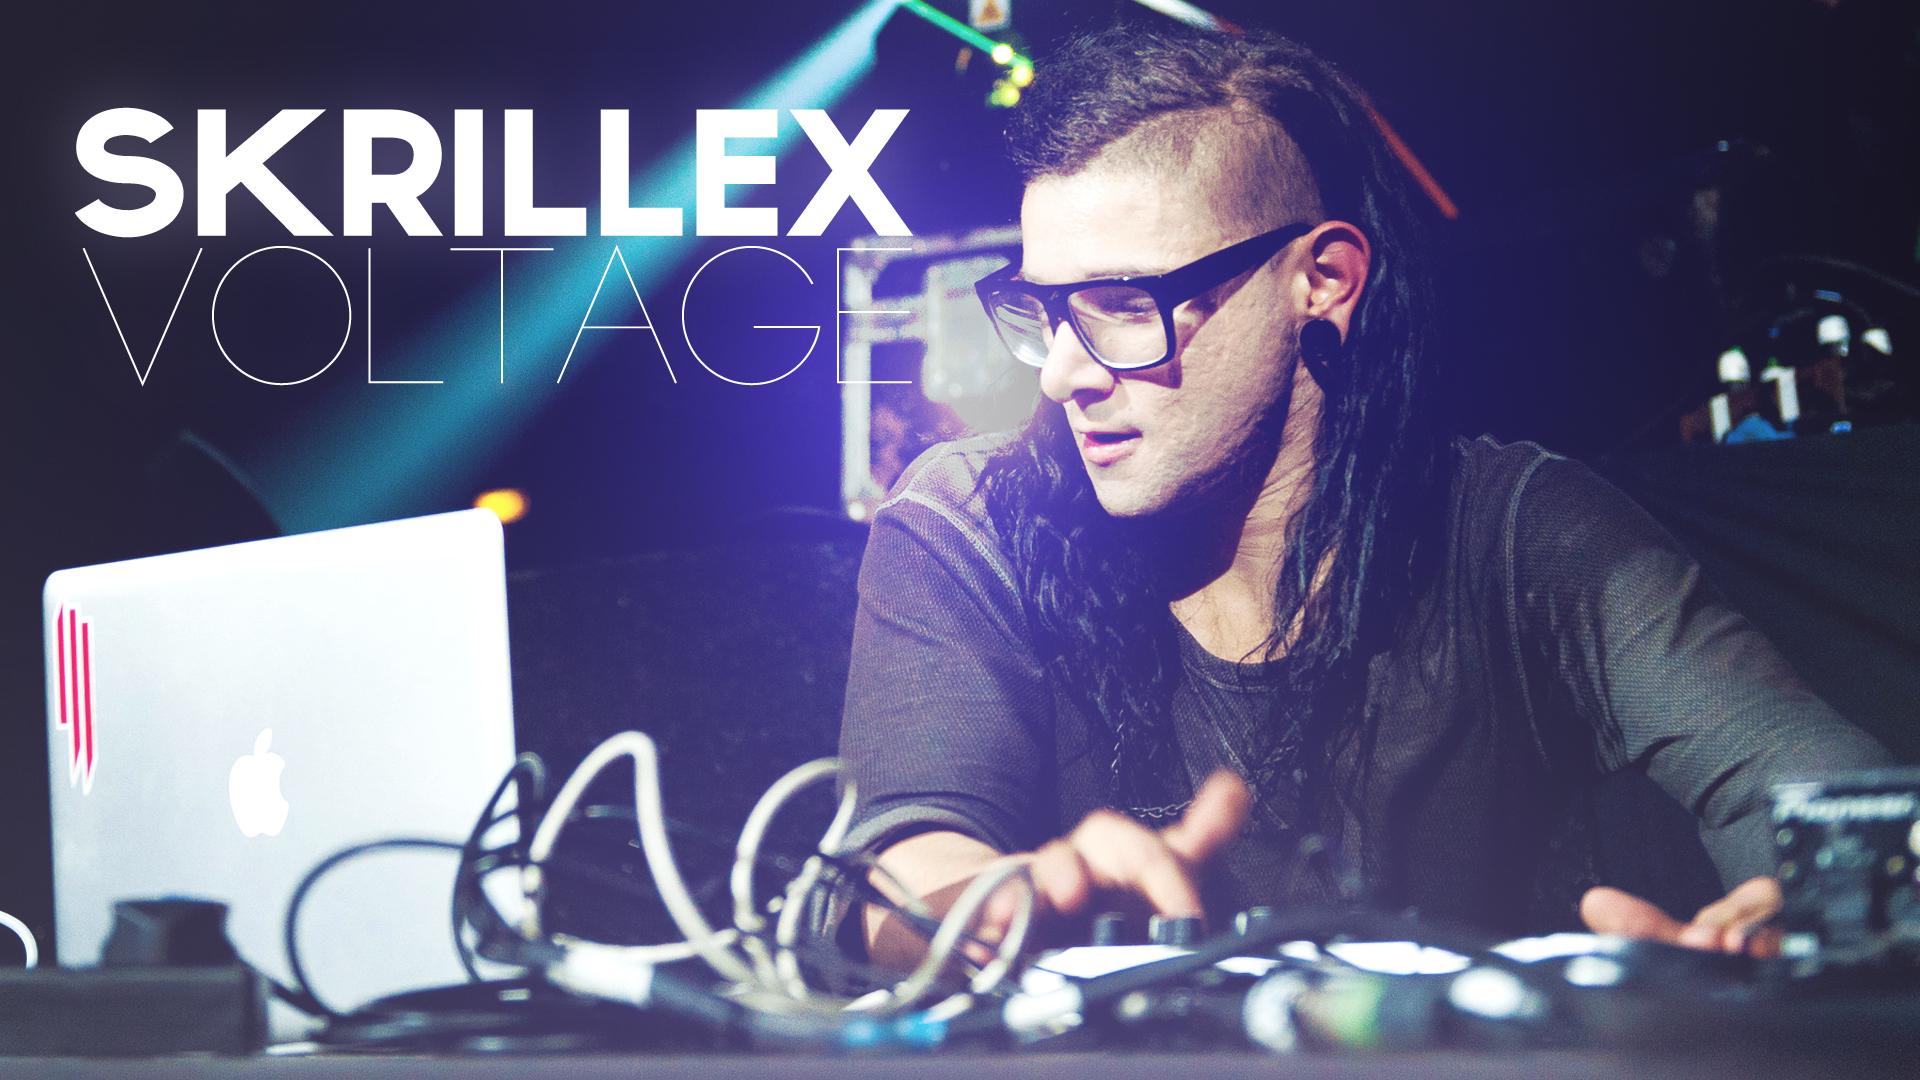 Skrillex full hd wallpaper and background image 1920x1080 id224306 music skrillex dubstep trance music wallpaper voltagebd Choice Image